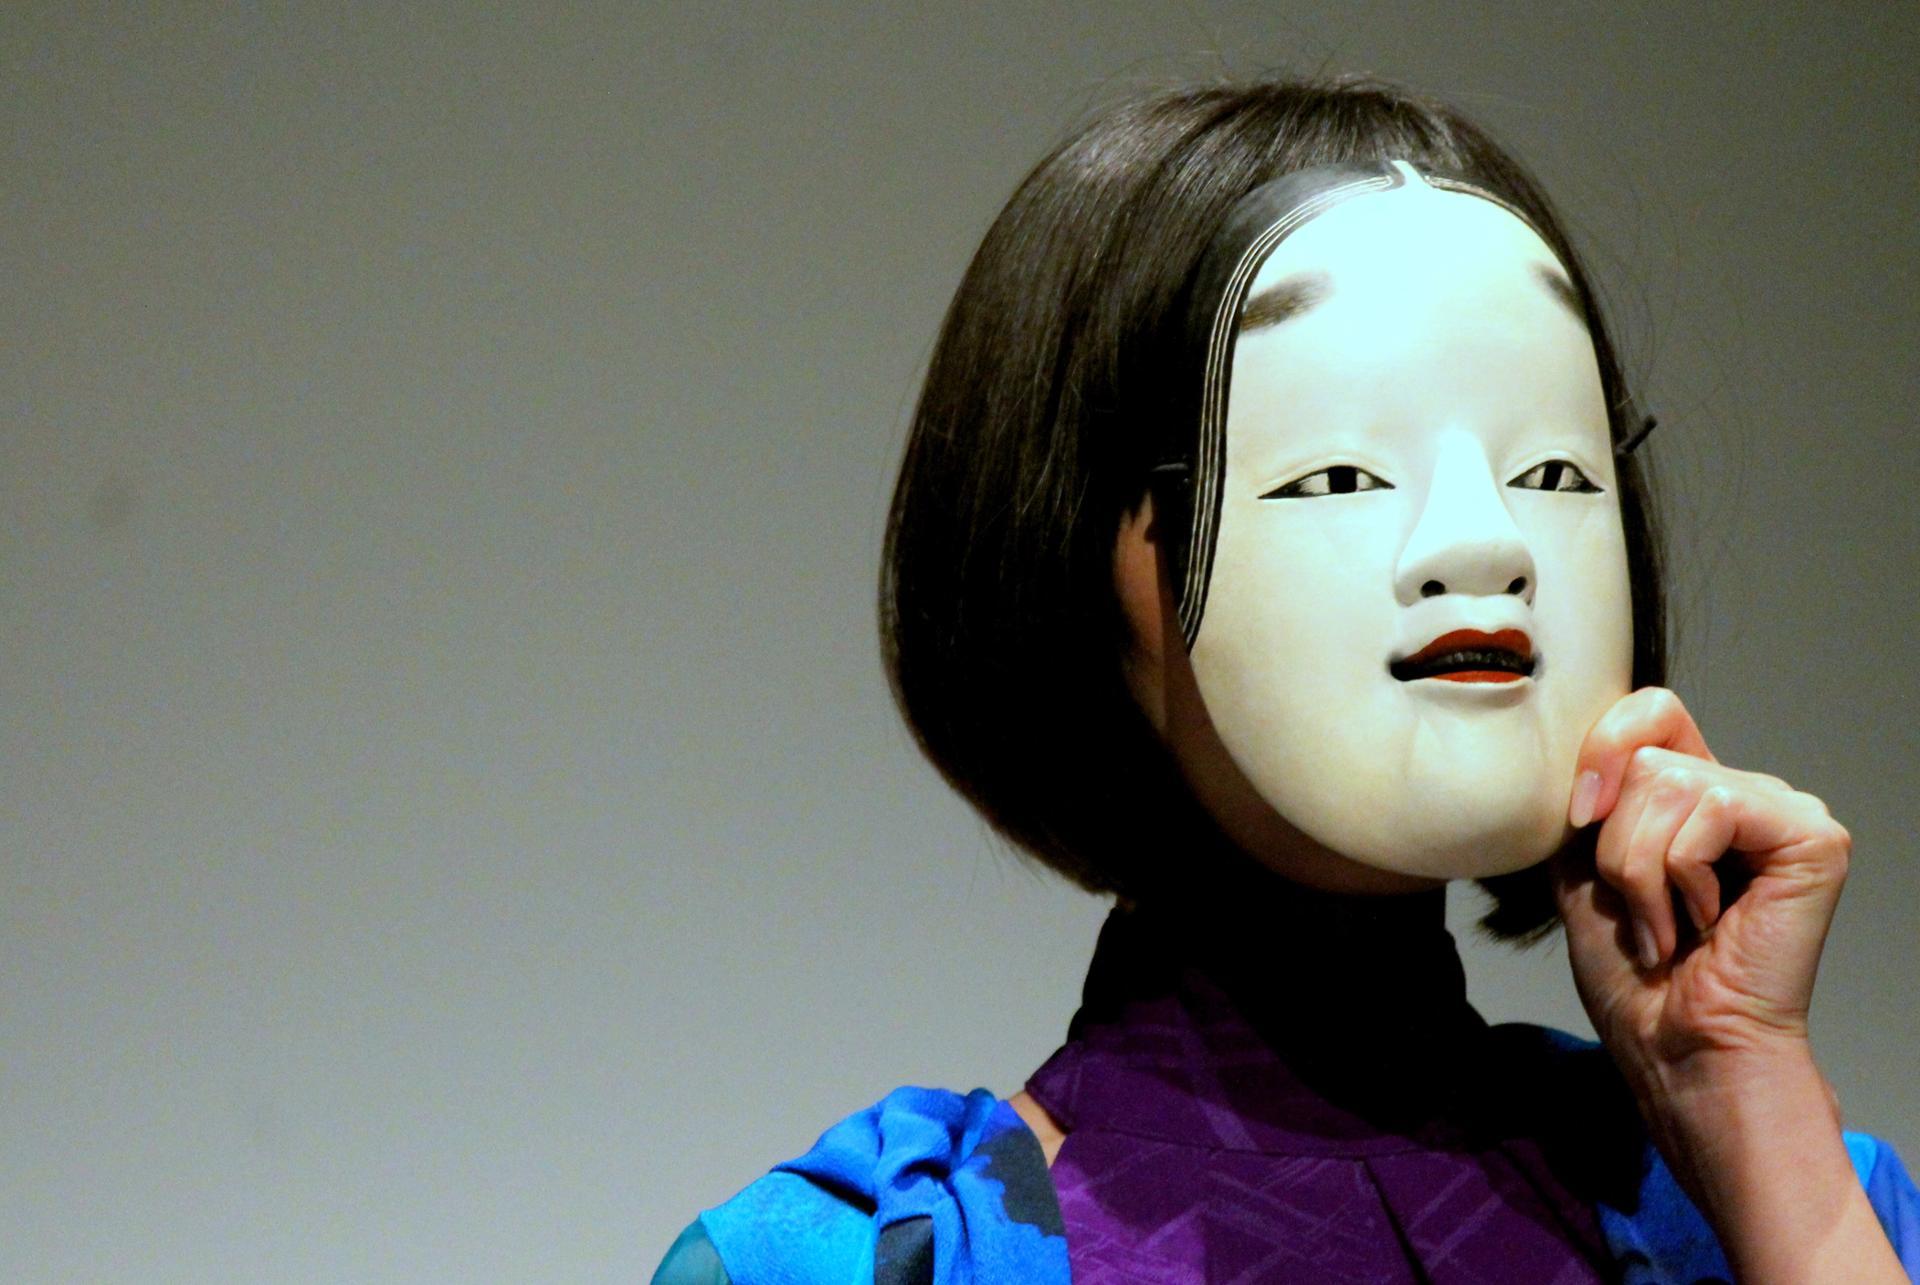 défilé japonais Eiko kobayashi â la mcjp photo jean Couturier